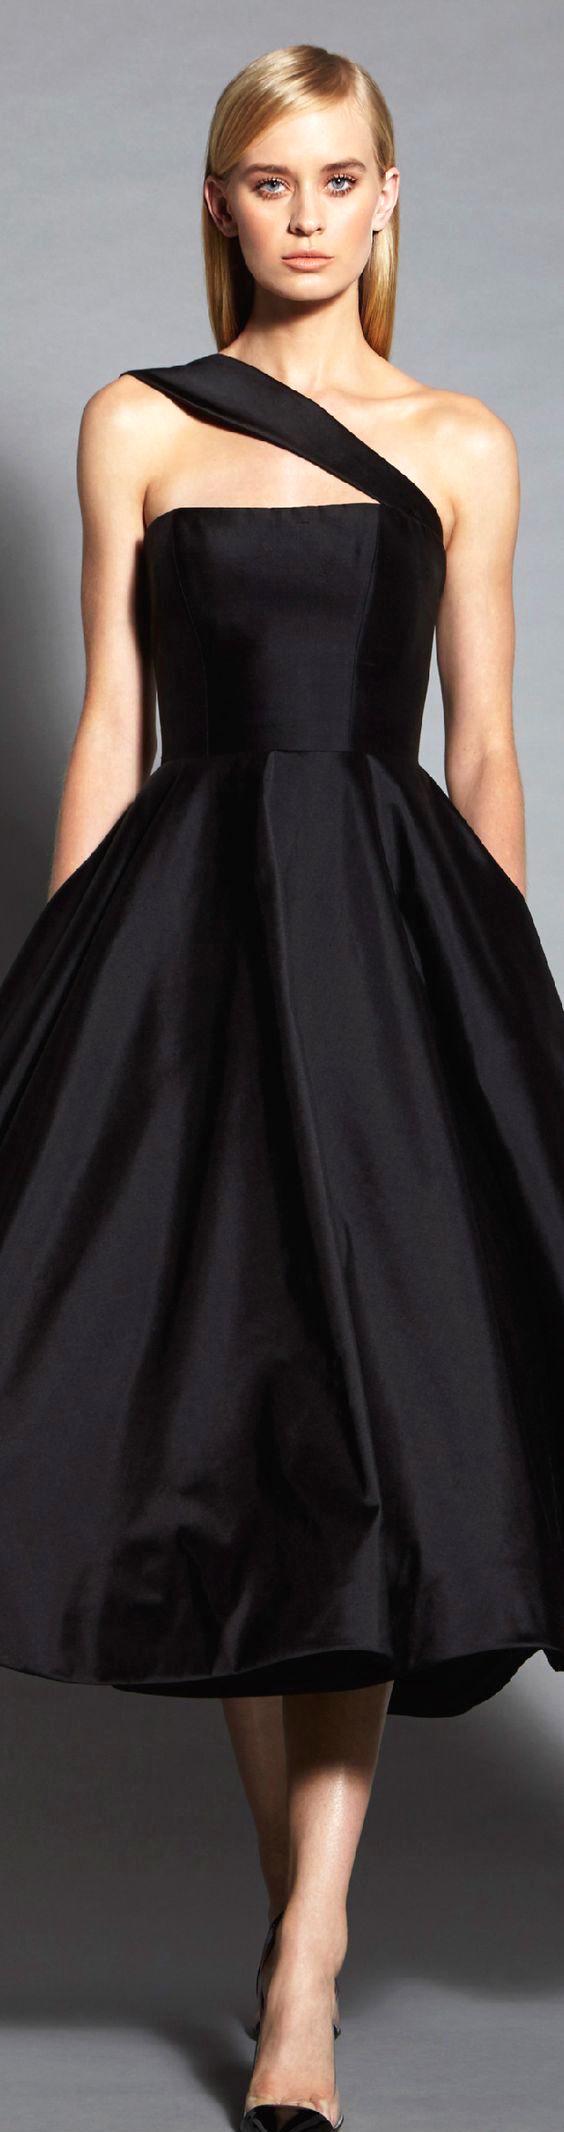 elegant black wedding dresses photo - 1